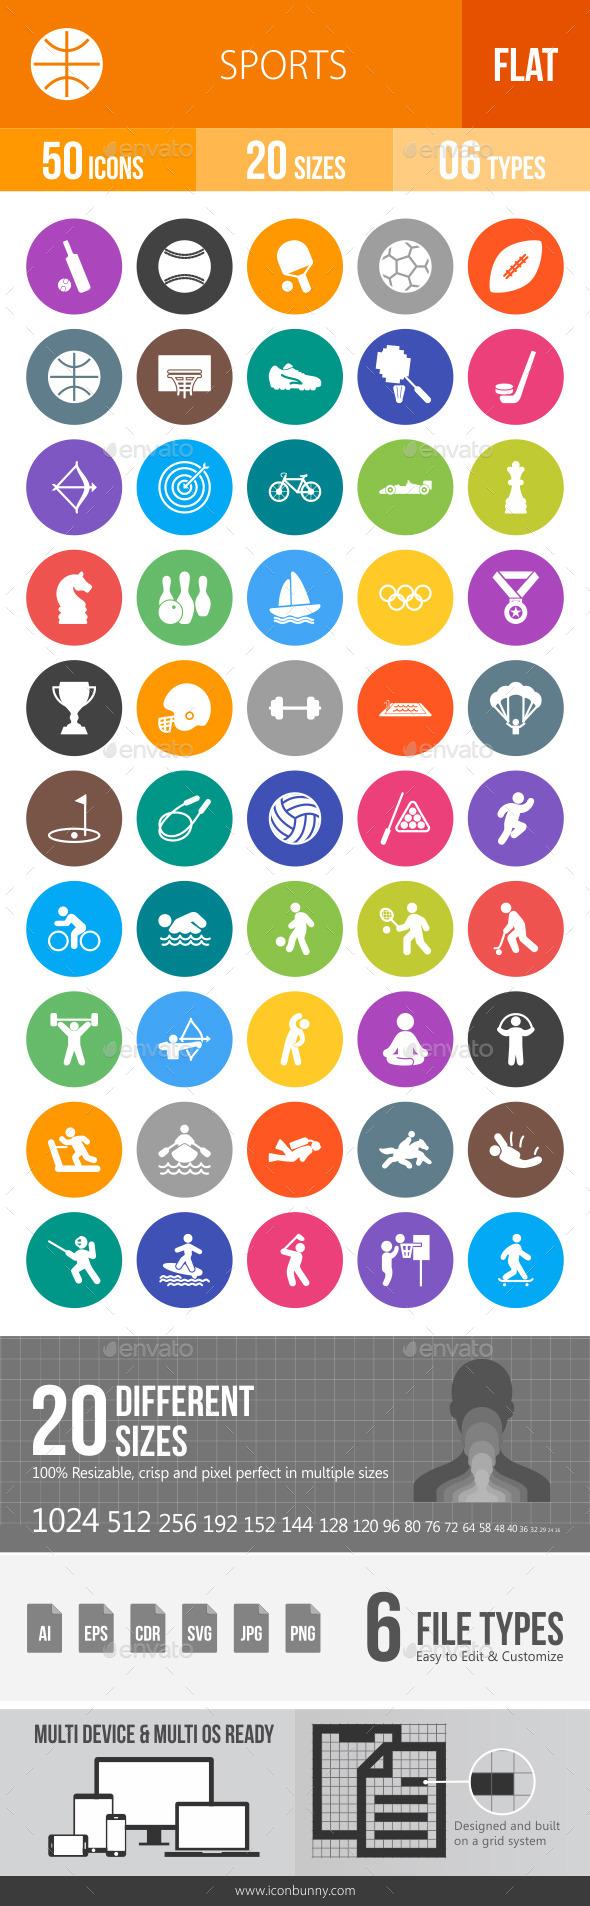 Sports Flat Round Icons